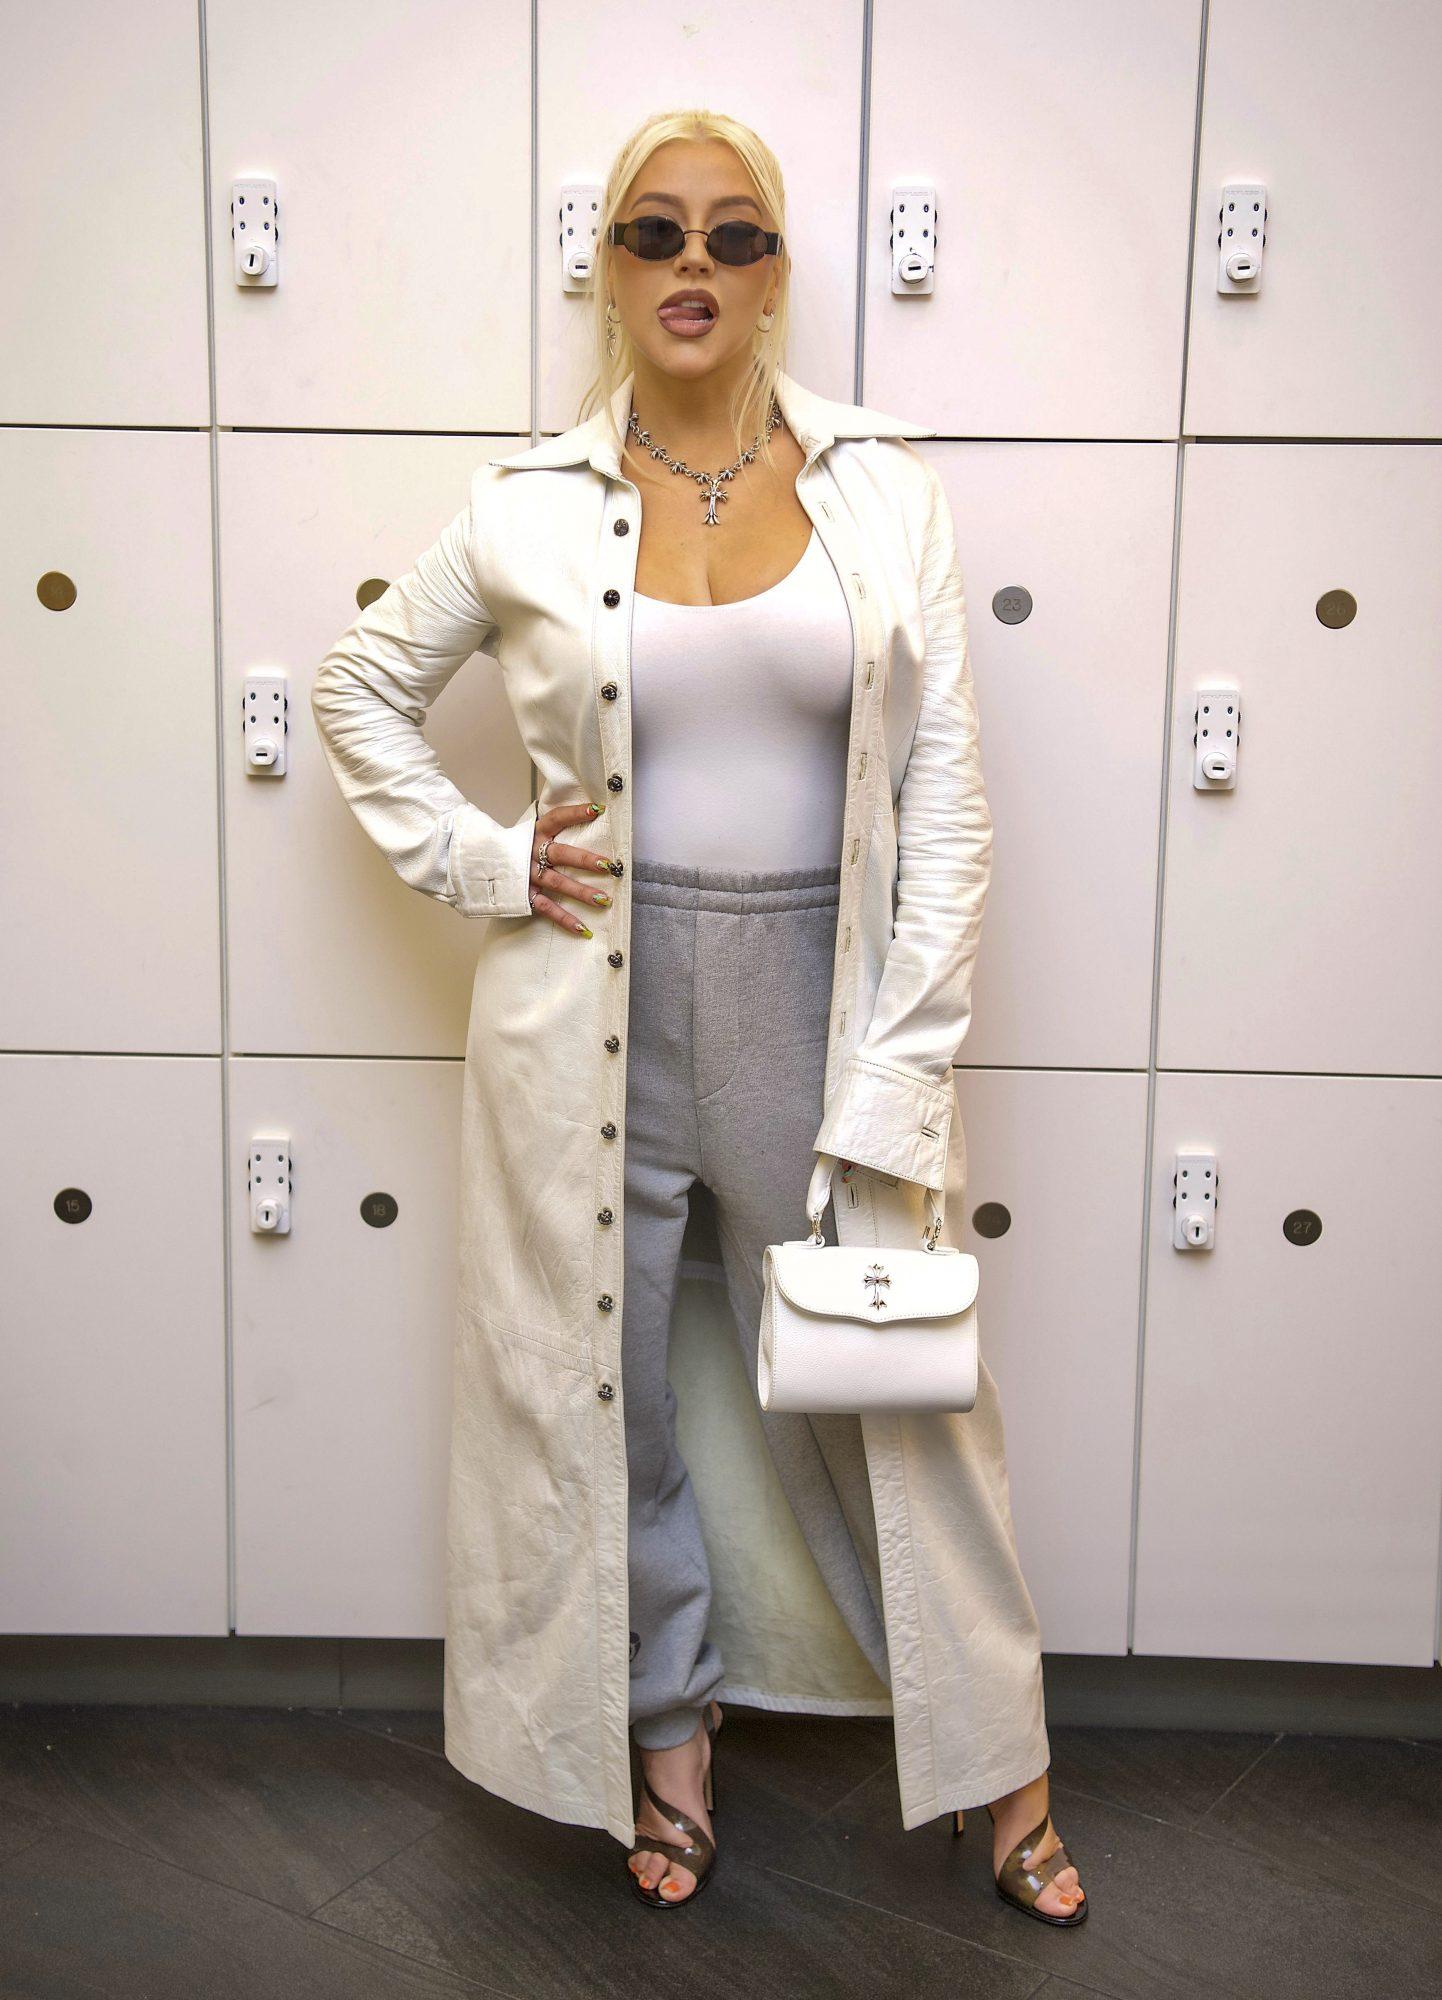 Christina Aguilera Soul Cycle atuendo deportivo